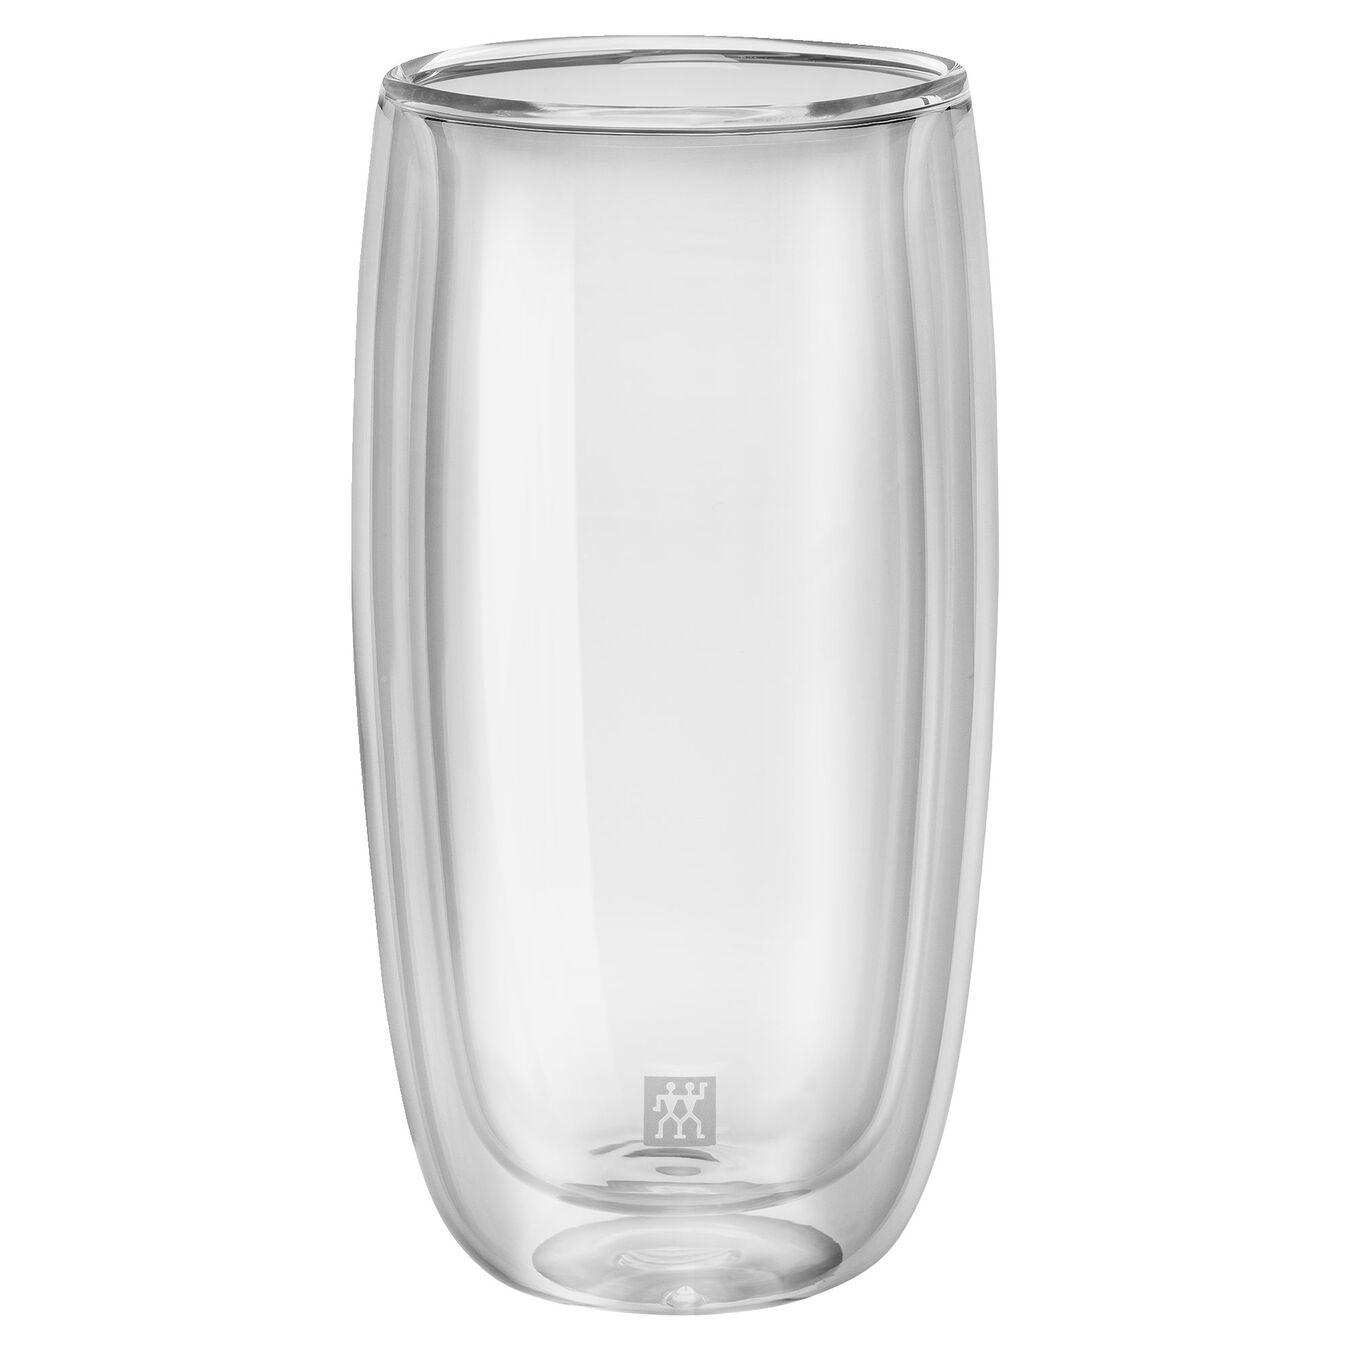 Set di bicchieri da softdrink - 2-pz., vetro borosilicato,,large 1